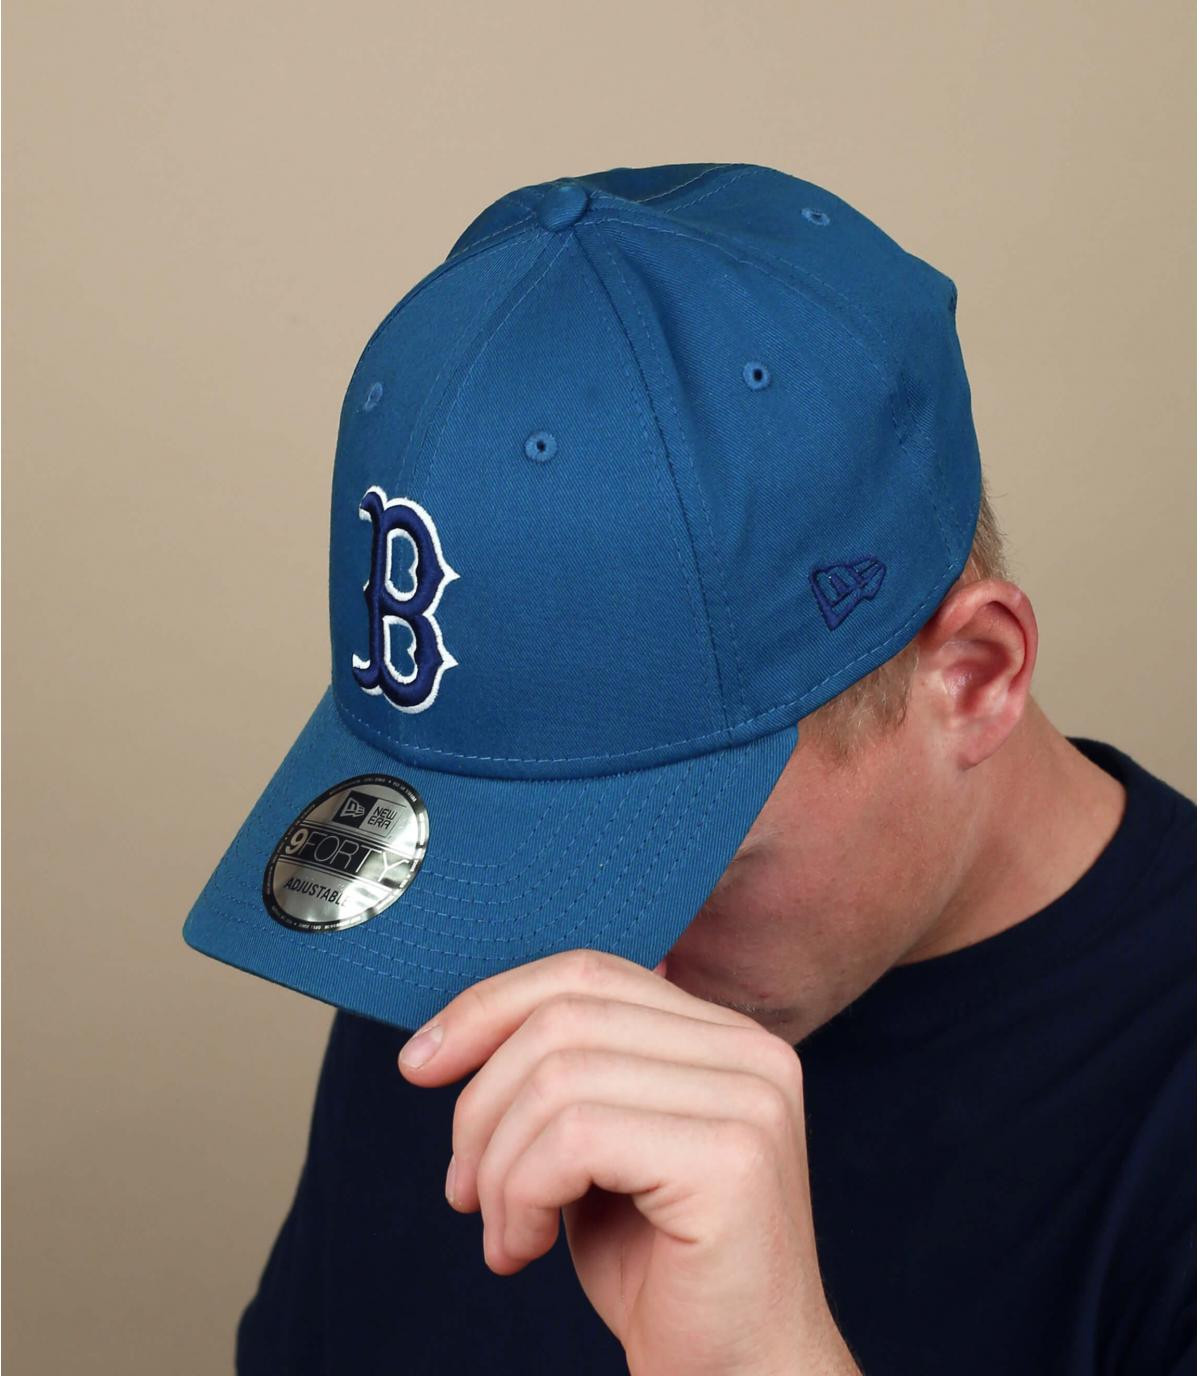 blauwgrijze B cap